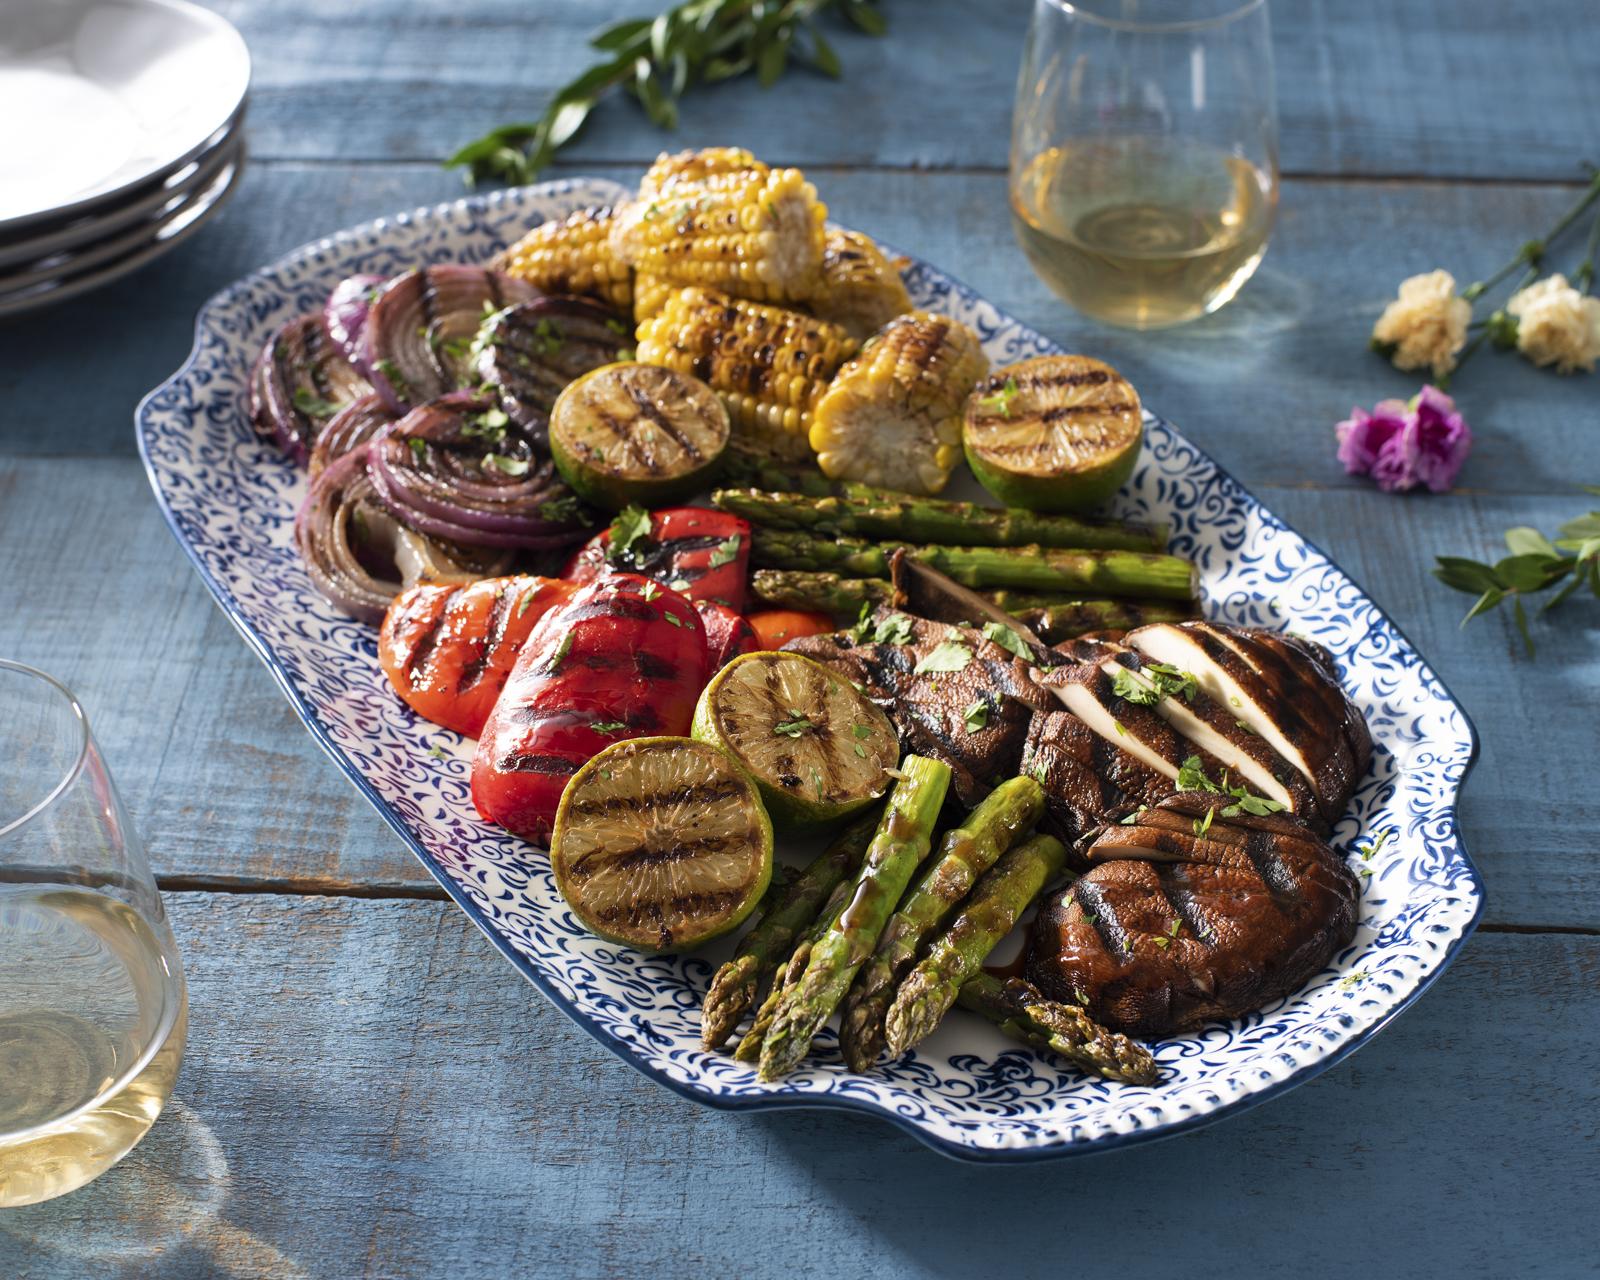 Grilled Teriyaki Mixed Veggie Platter Ready Set Eat